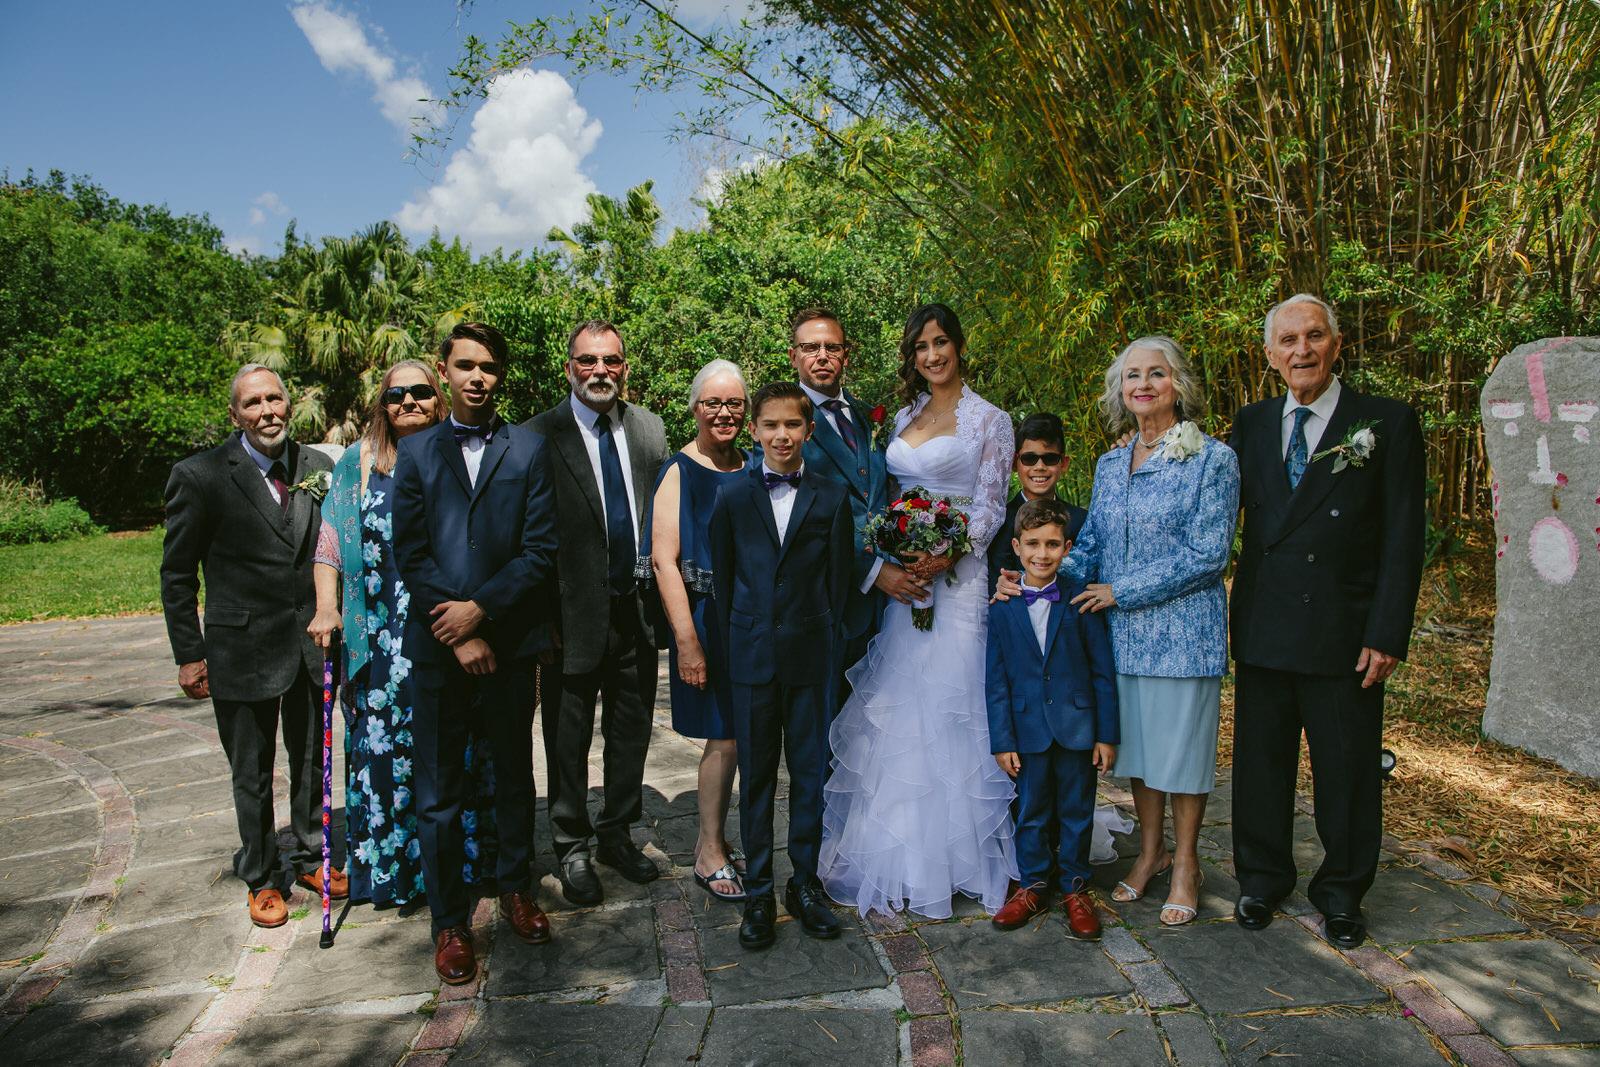 kashi-ashram-wedding-family-formal-portraits.jpg